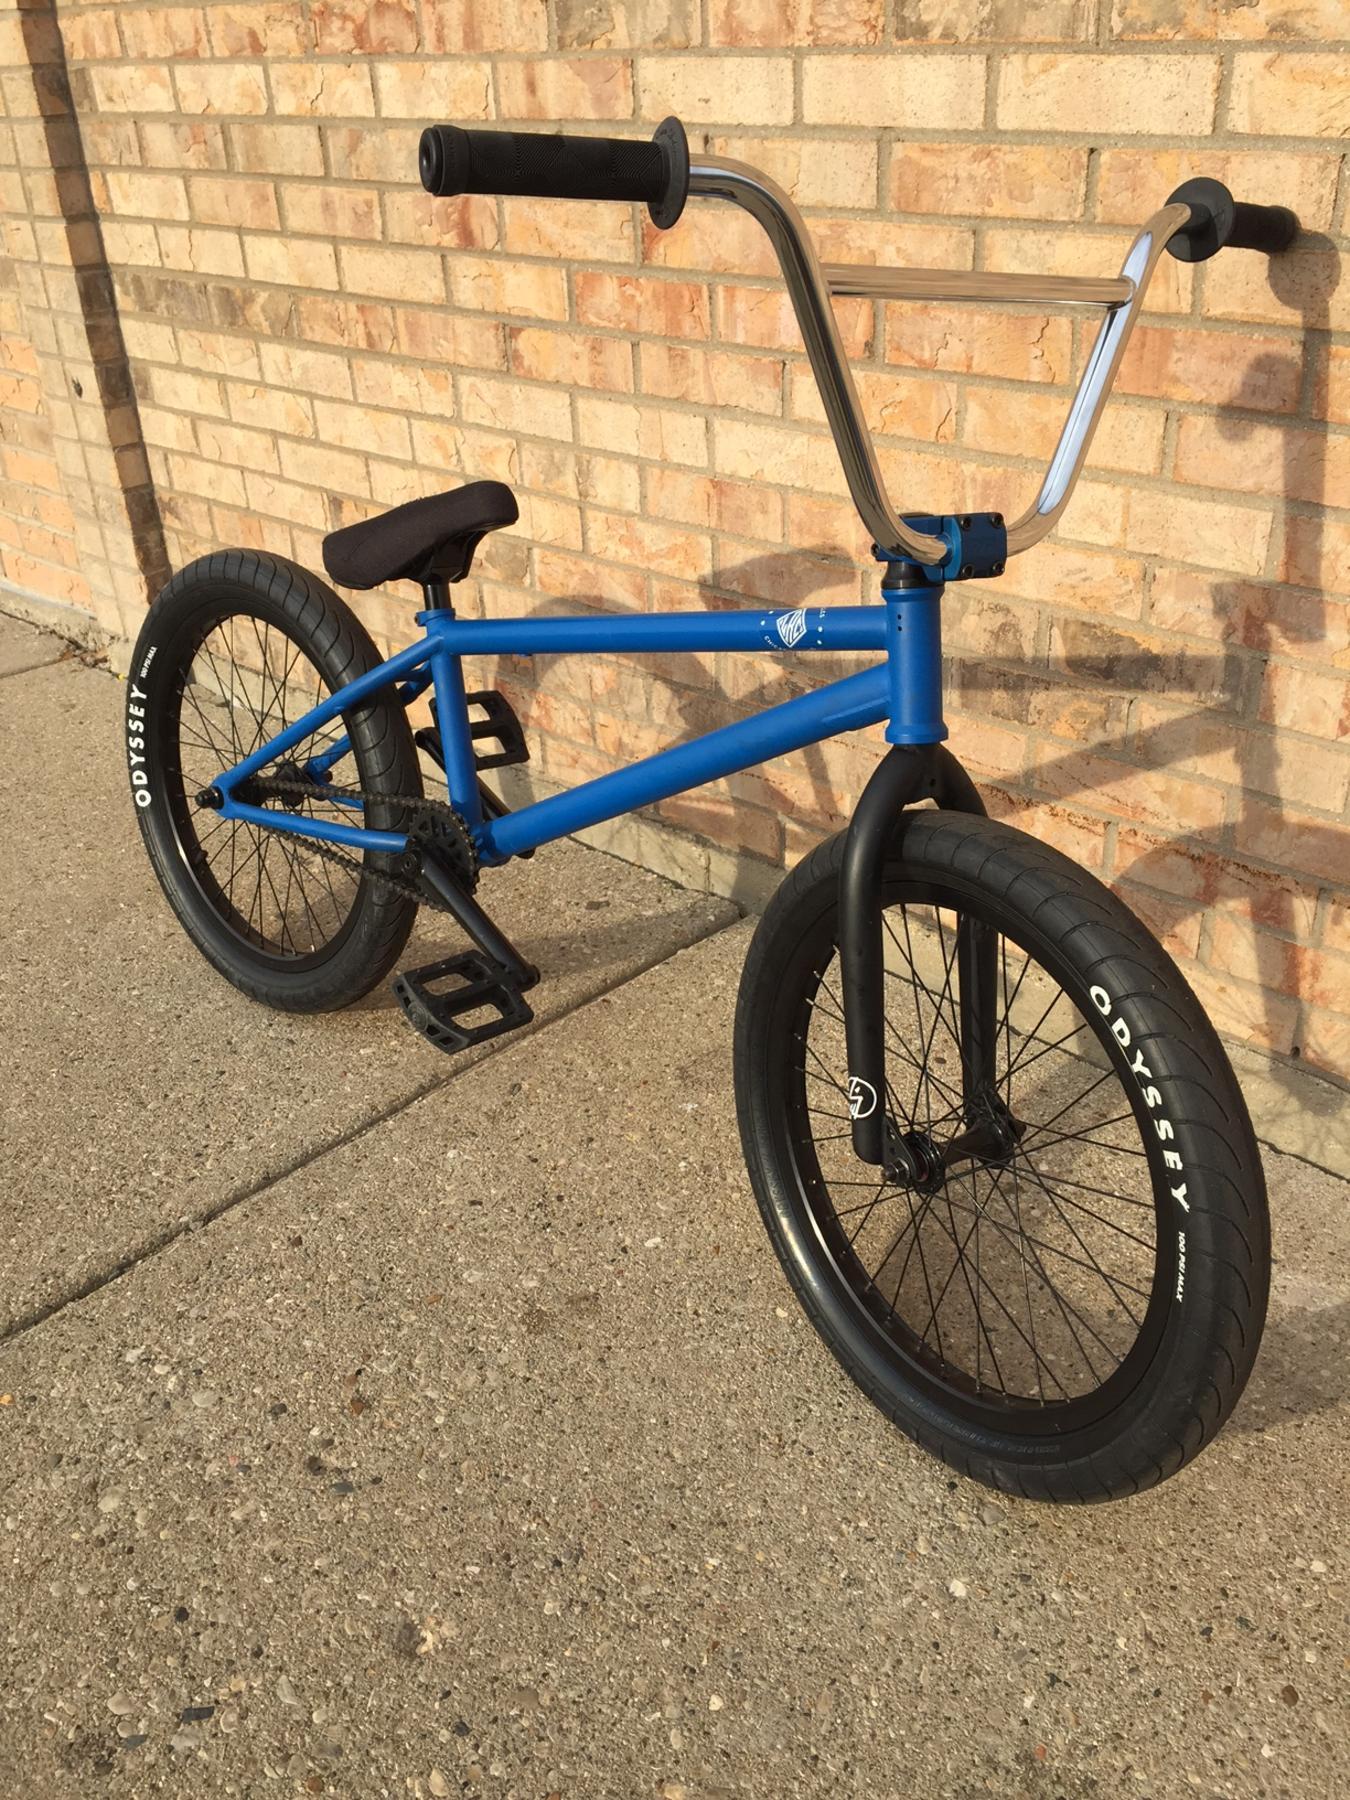 My bike on the bmx museum